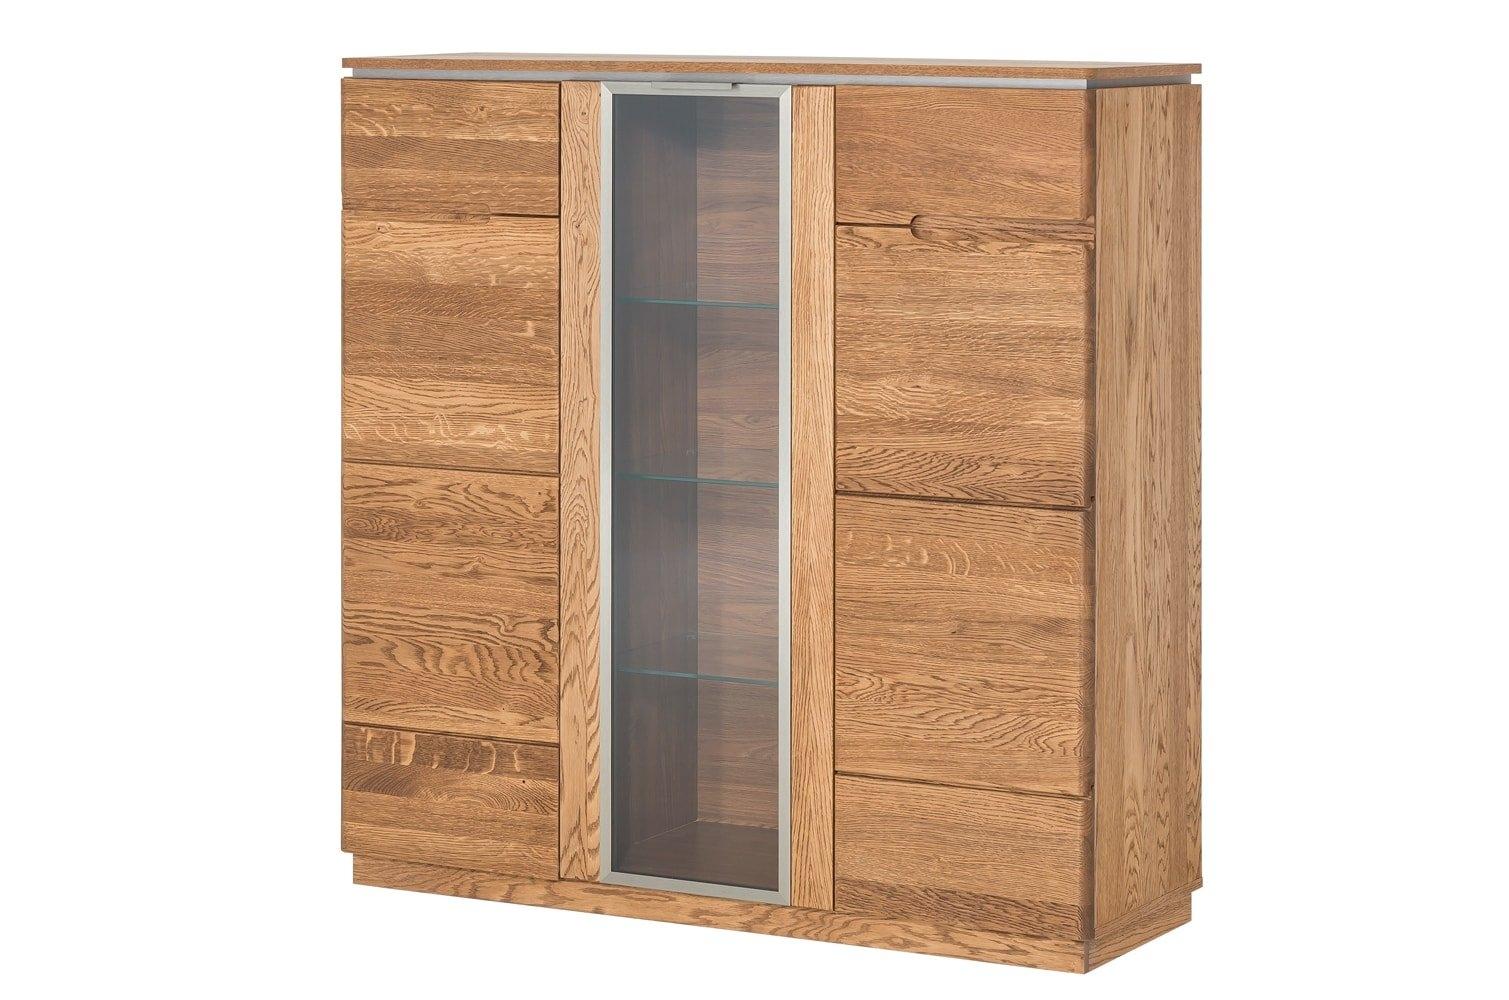 Dulap cu vitrina din lemn si furnir, cu 3 usi Montenegro 48 Stejar Rustic, l120xA42xH125 cm